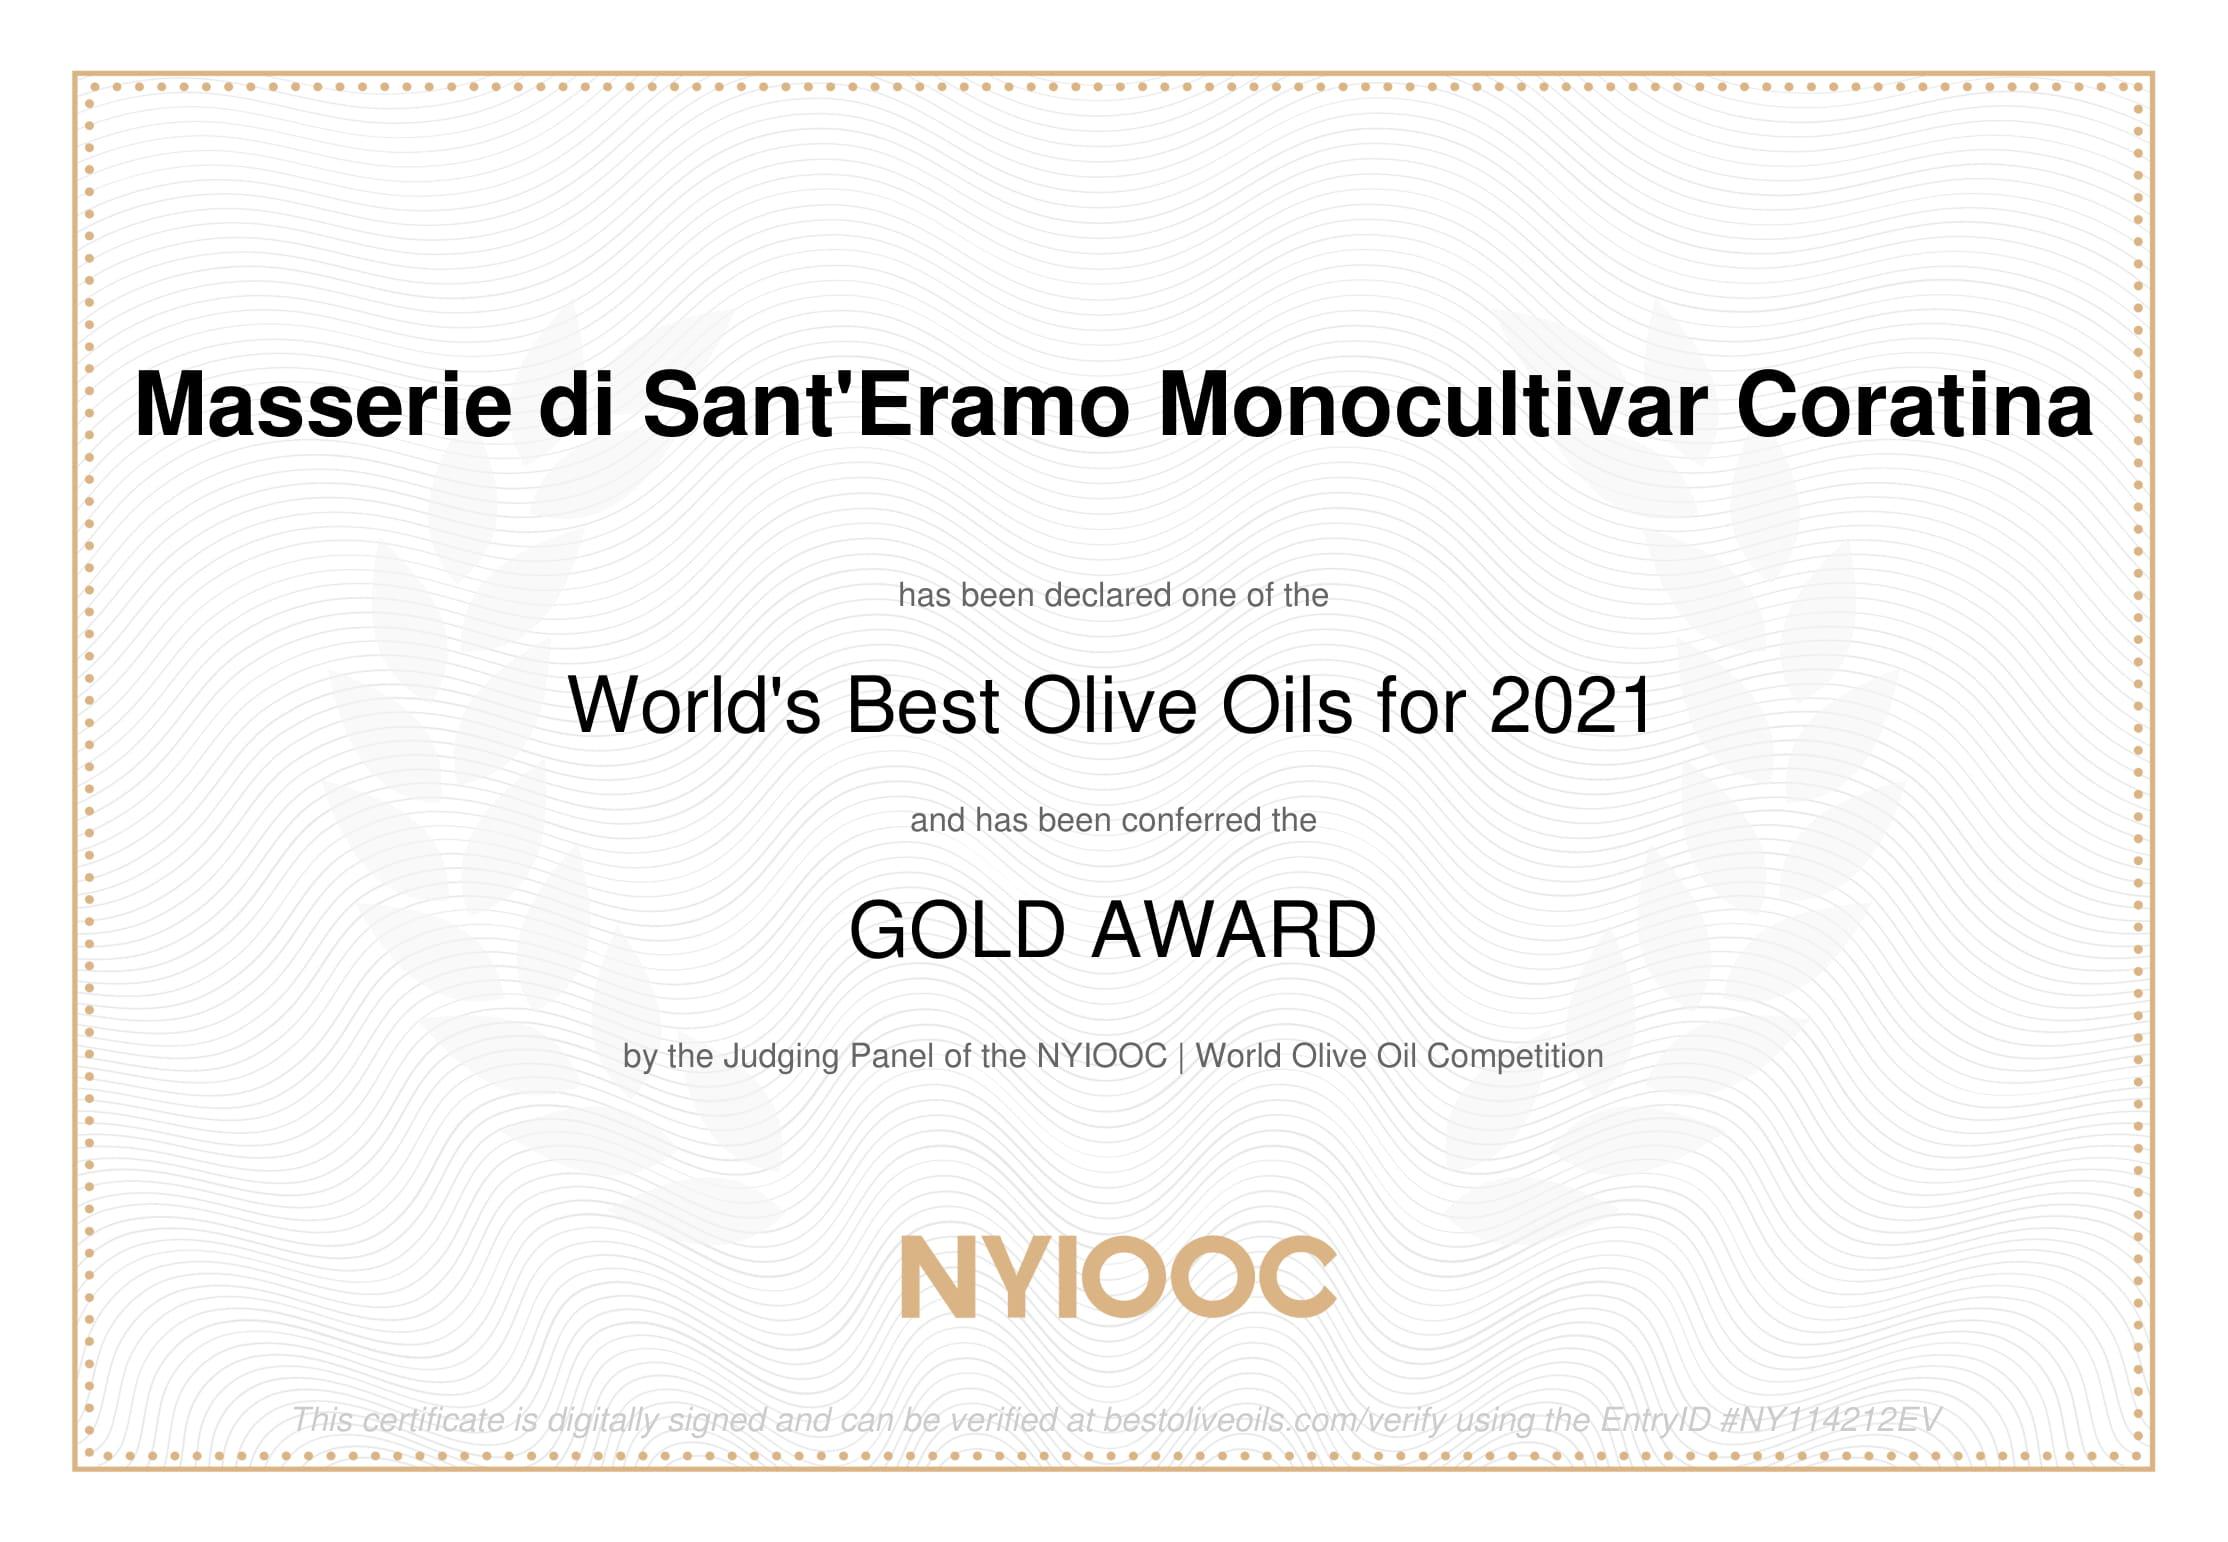 Masserie Di Sant'Eramo  MONOCULTIVAR EXTRA VIRGIN OLIVE OIL – GOLD AWARD WINNERS of NYIOOC World's Best Olive Oils 2021